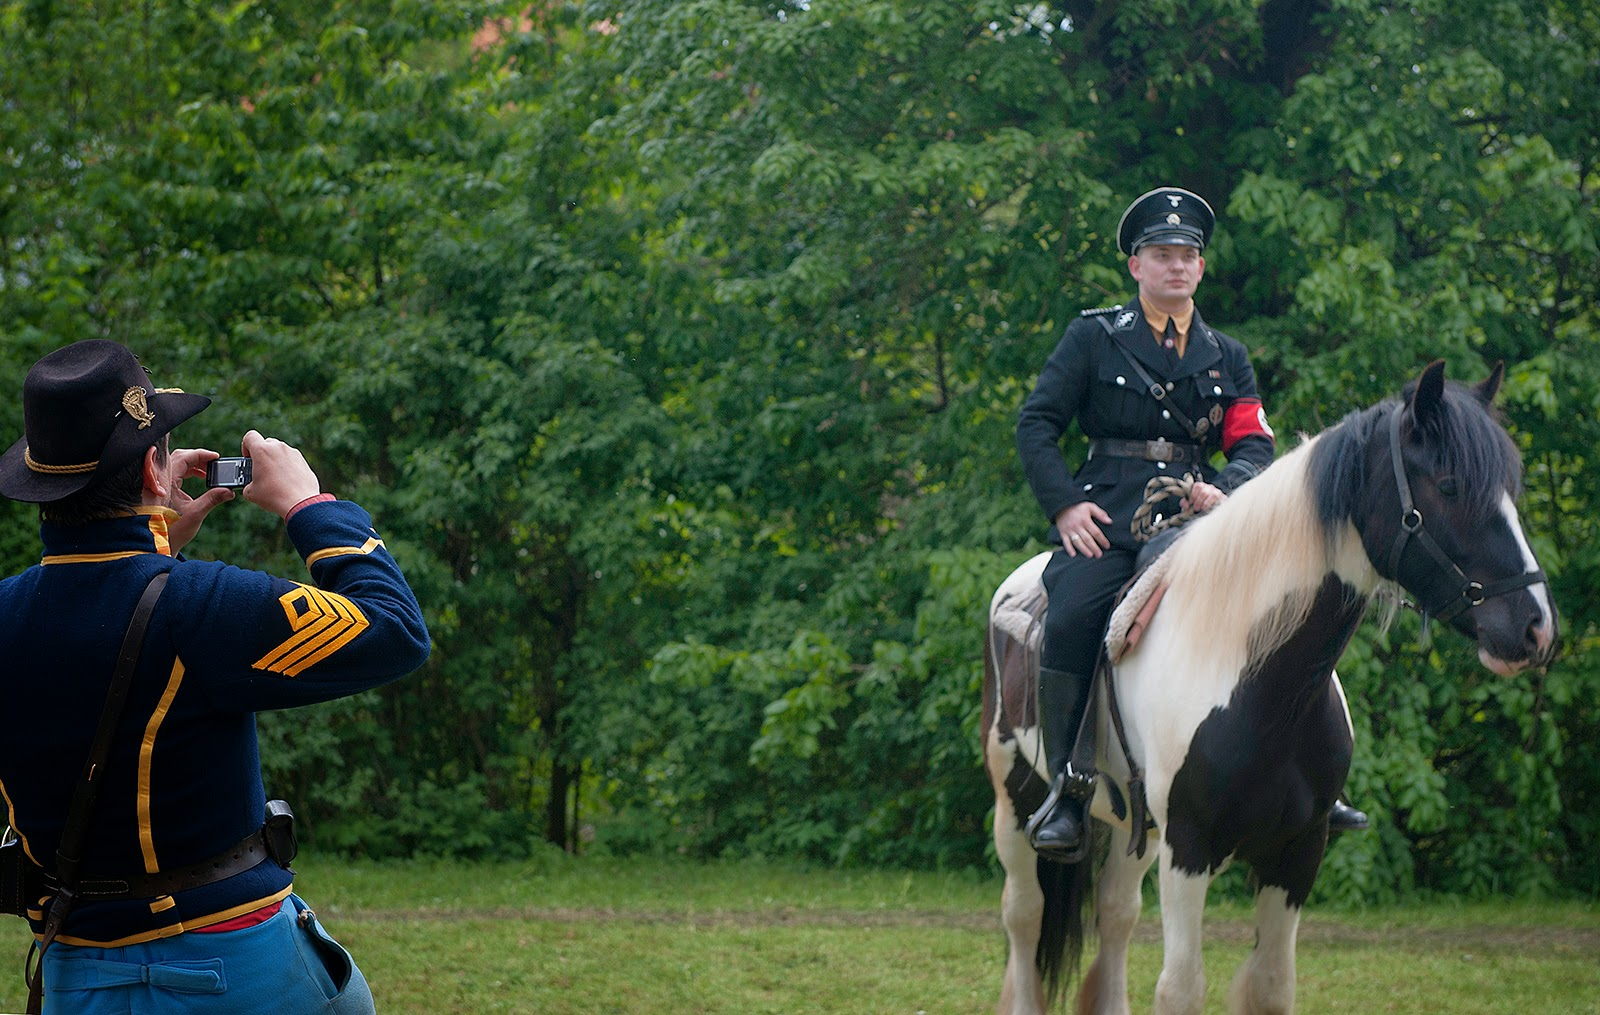 U.S. Cavalry, German Soldiers, WWII, World War II